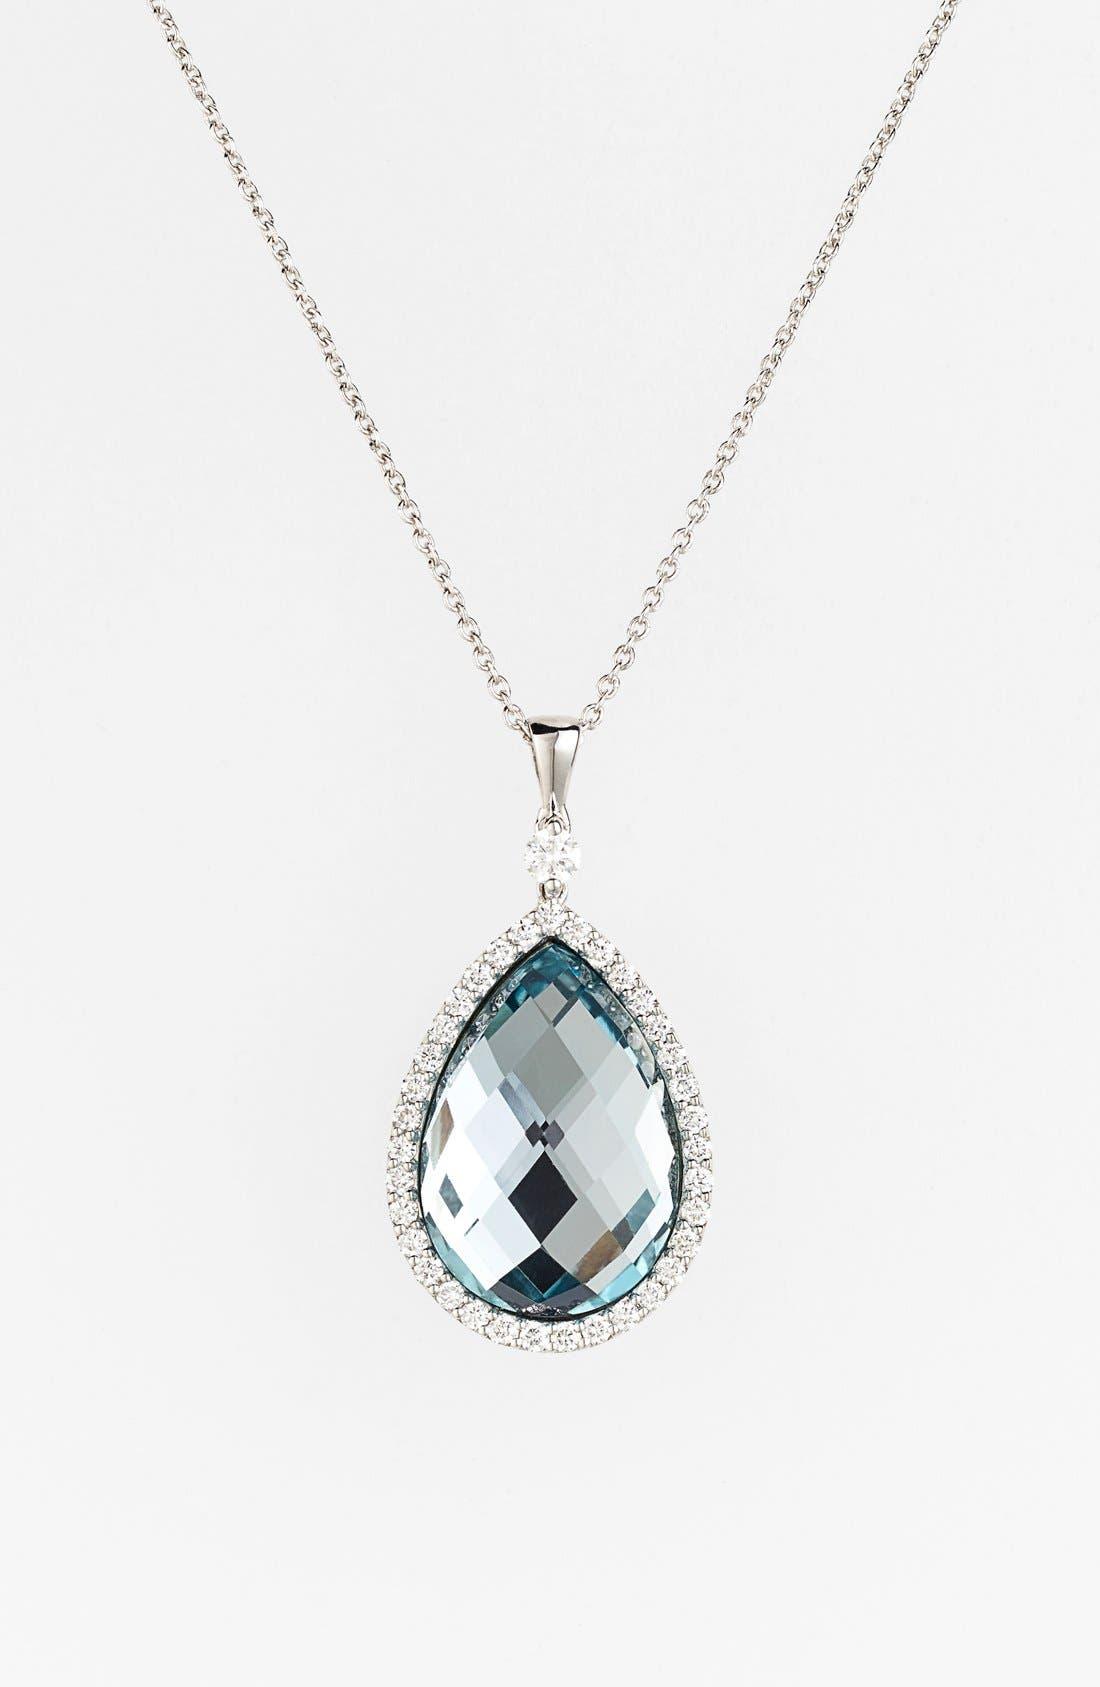 Main Image - Roberto Coin Diamond Teardrop Pendant Necklace